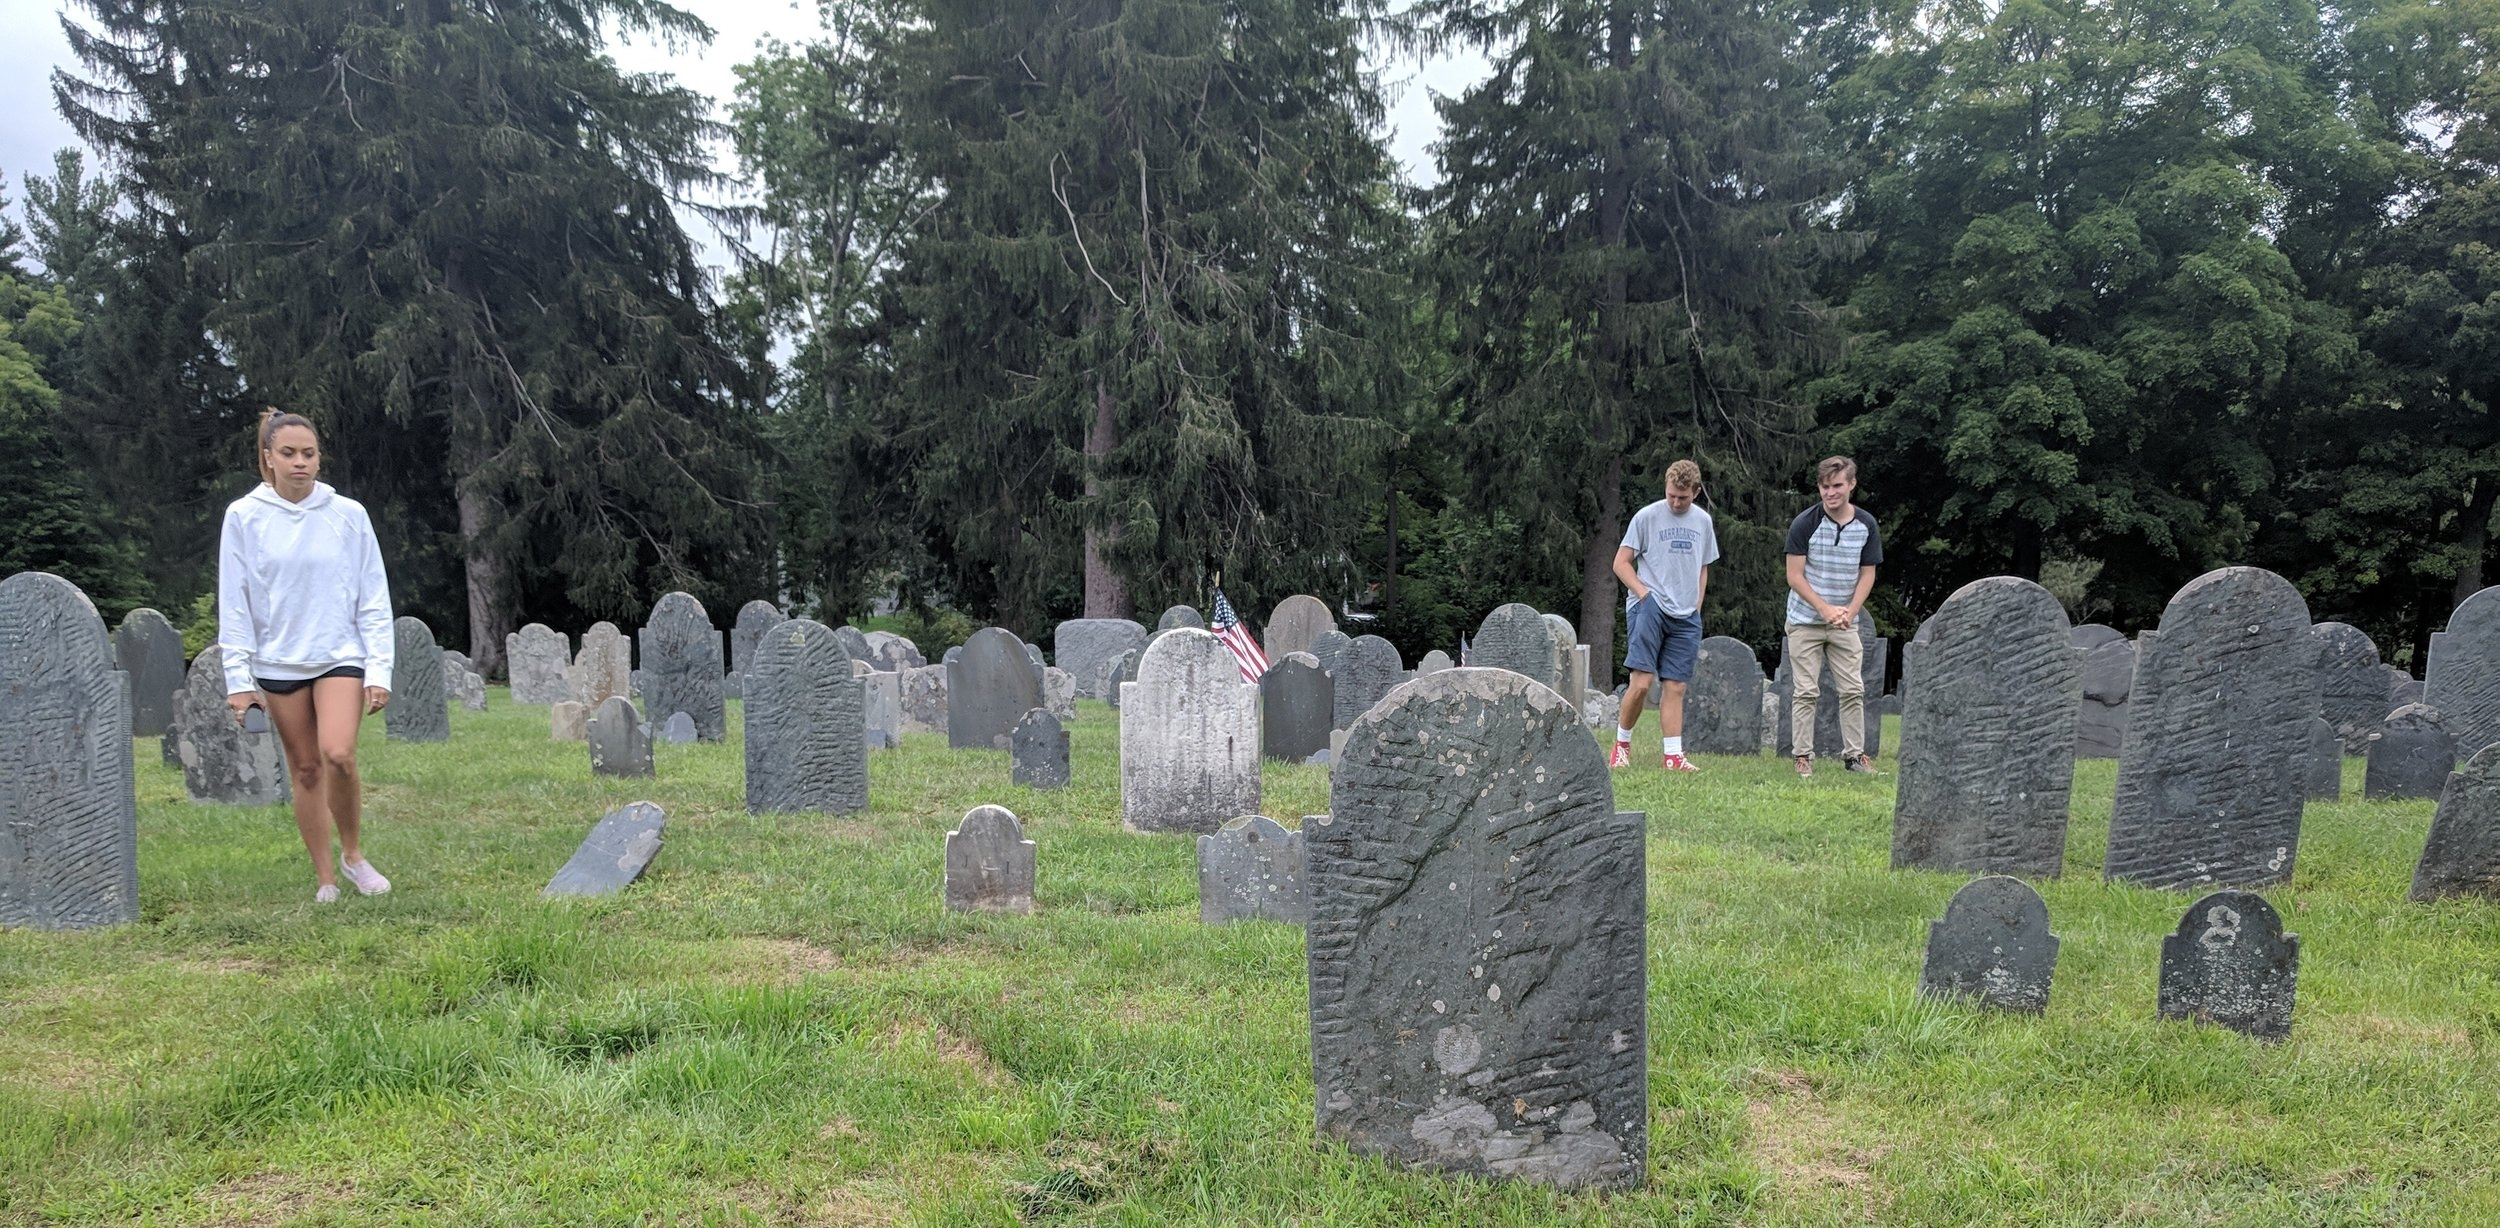 Taylor Galusha, Daniel Proulx, and Robert Tolan wander among the headstones.